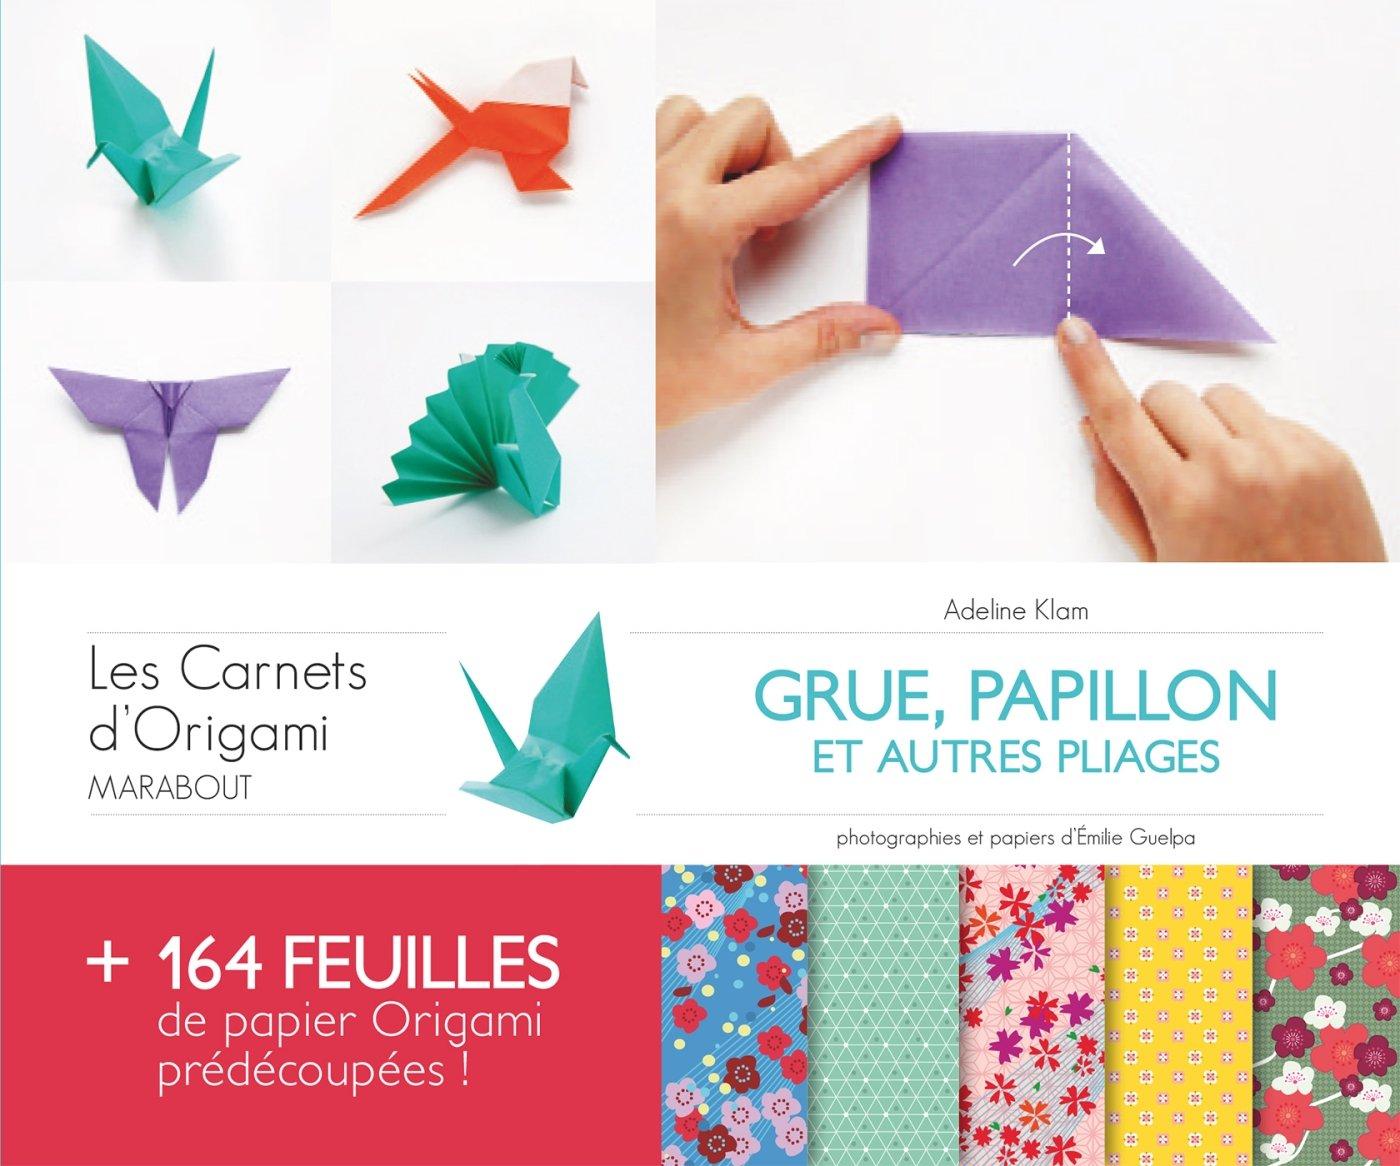 Carnet Origami Grue Papillon 9782501093637 Amazoncom Books